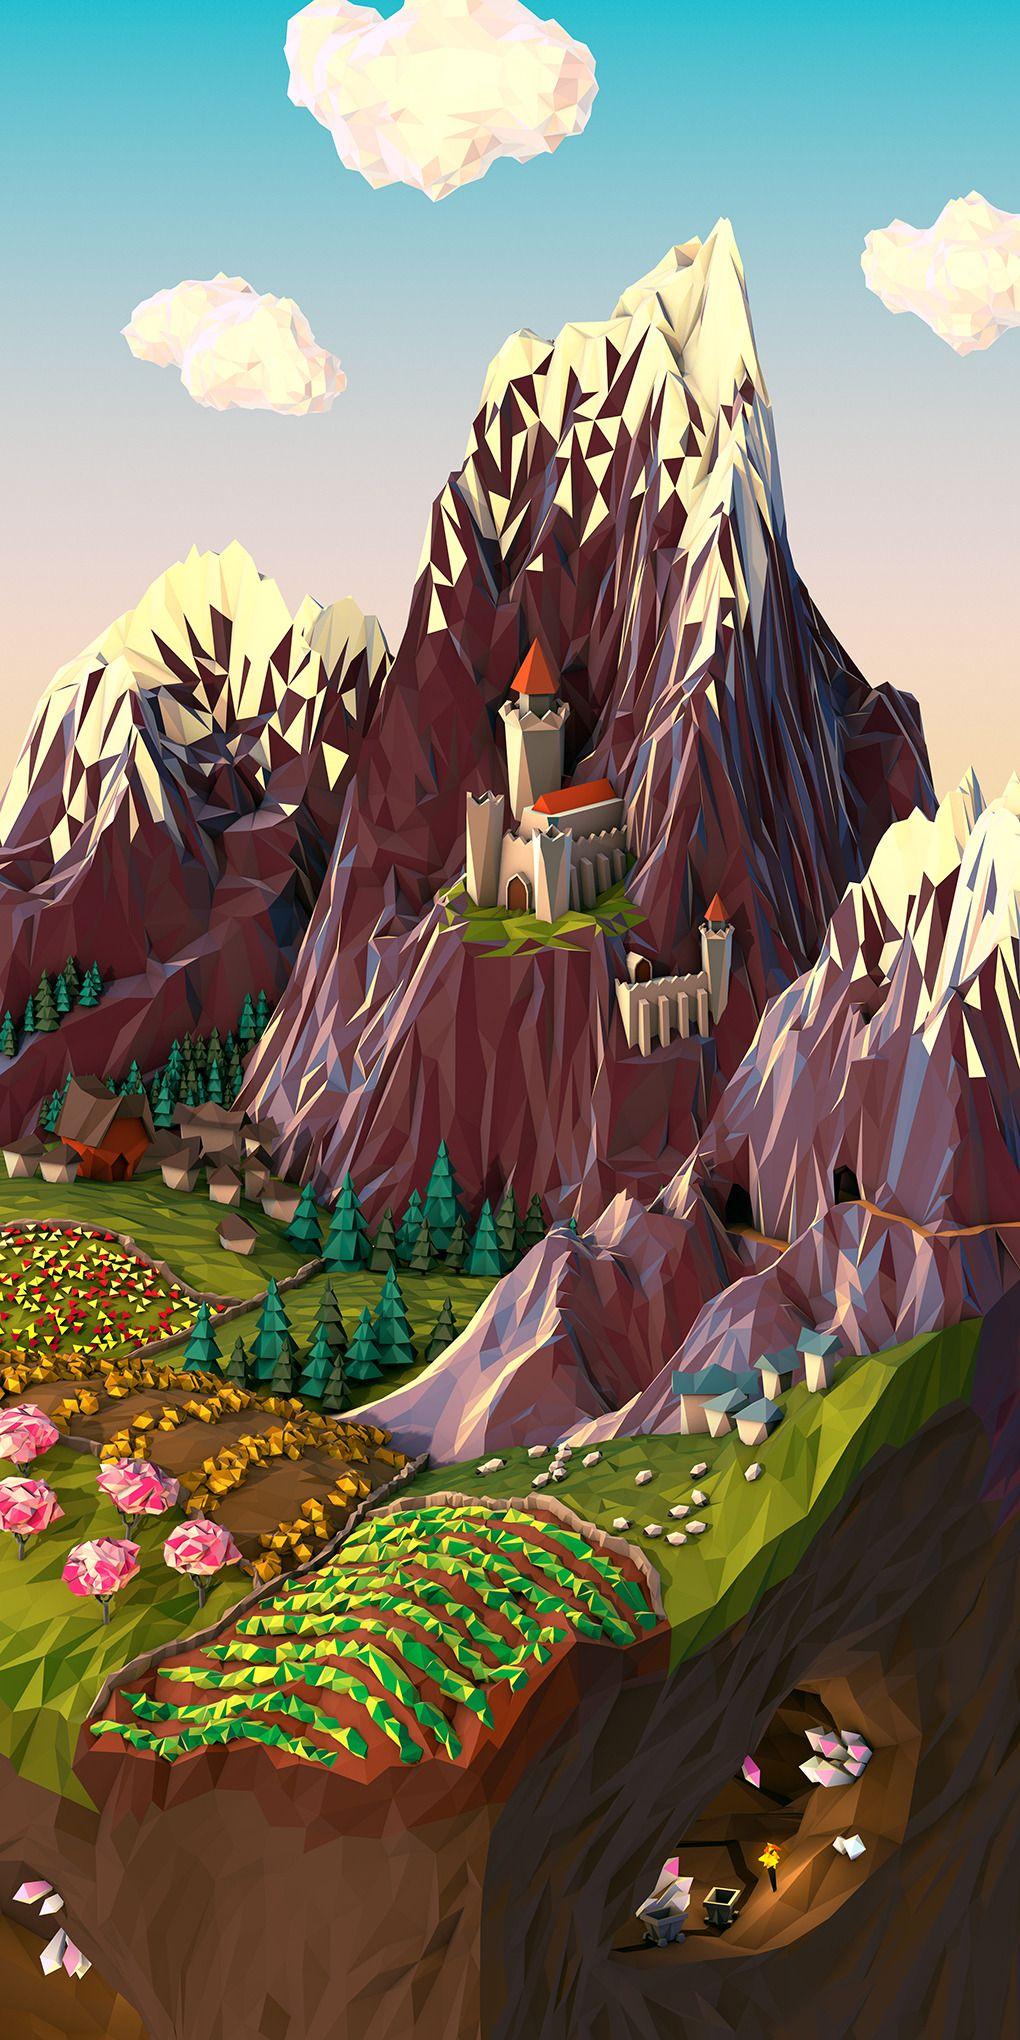 17 Best images about Landscape Illustration on Pinterest   Nu'est ...